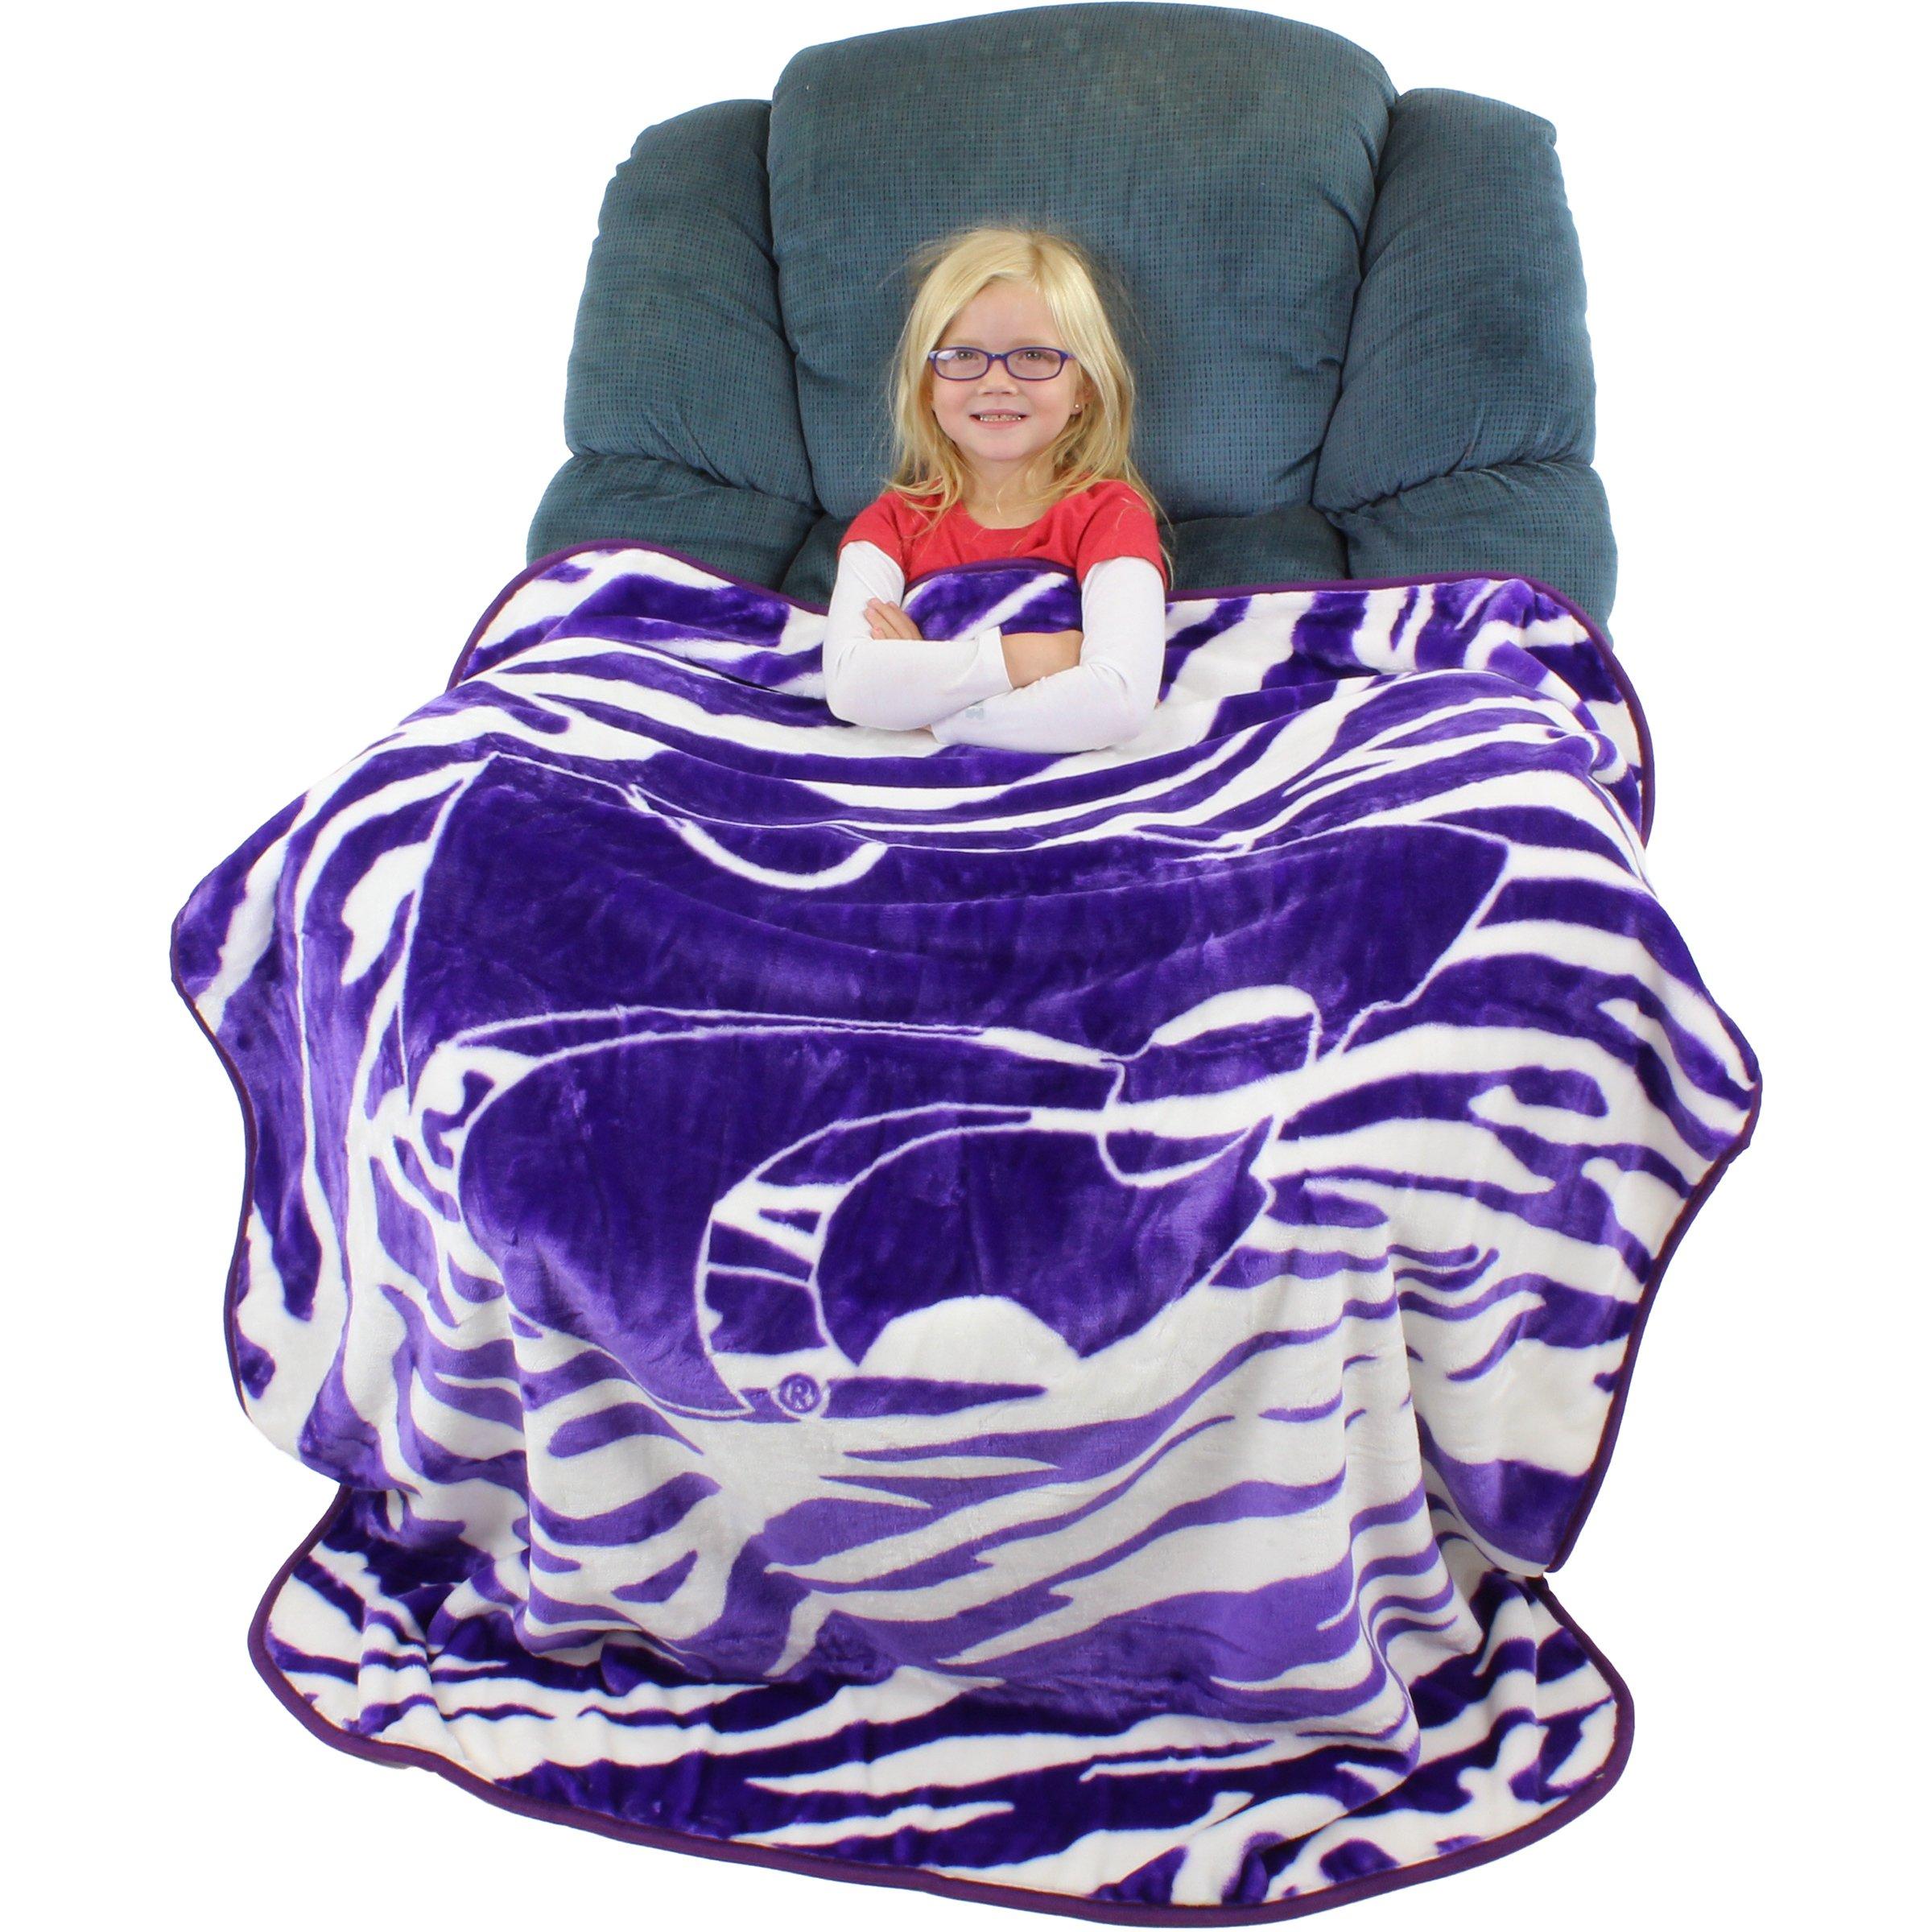 College Covers Kansas State Wildcats Super Soft Raschel Throw Blanket, 50'' x 60''